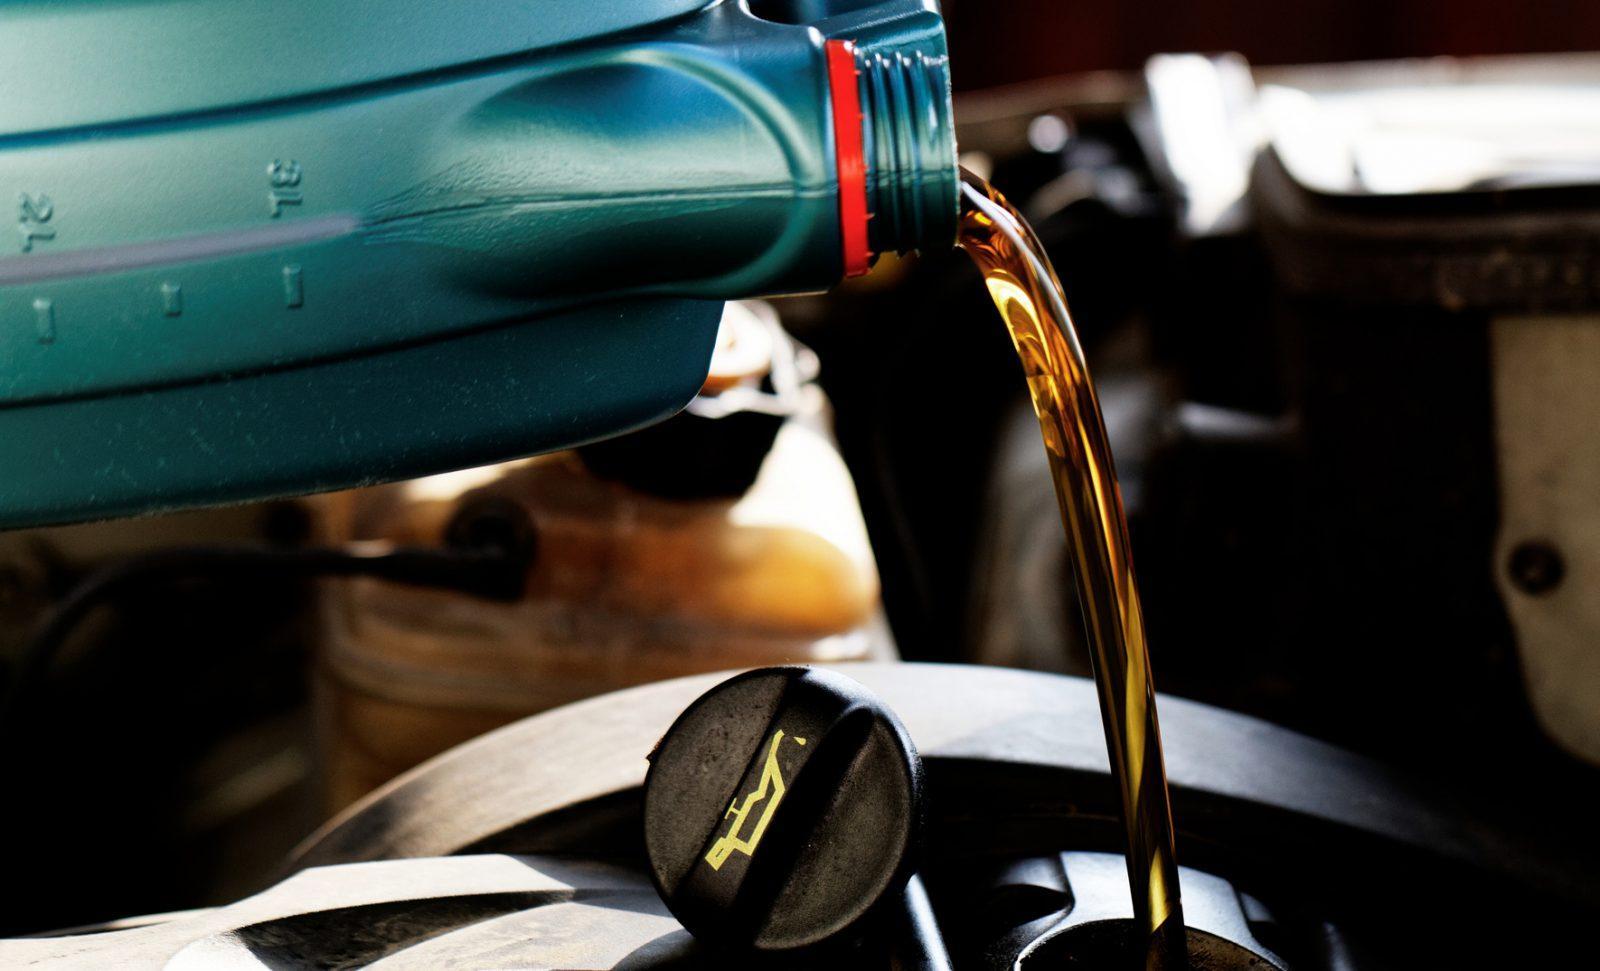 81 Subaru Gl Fuel Filter Location - 5 things you should